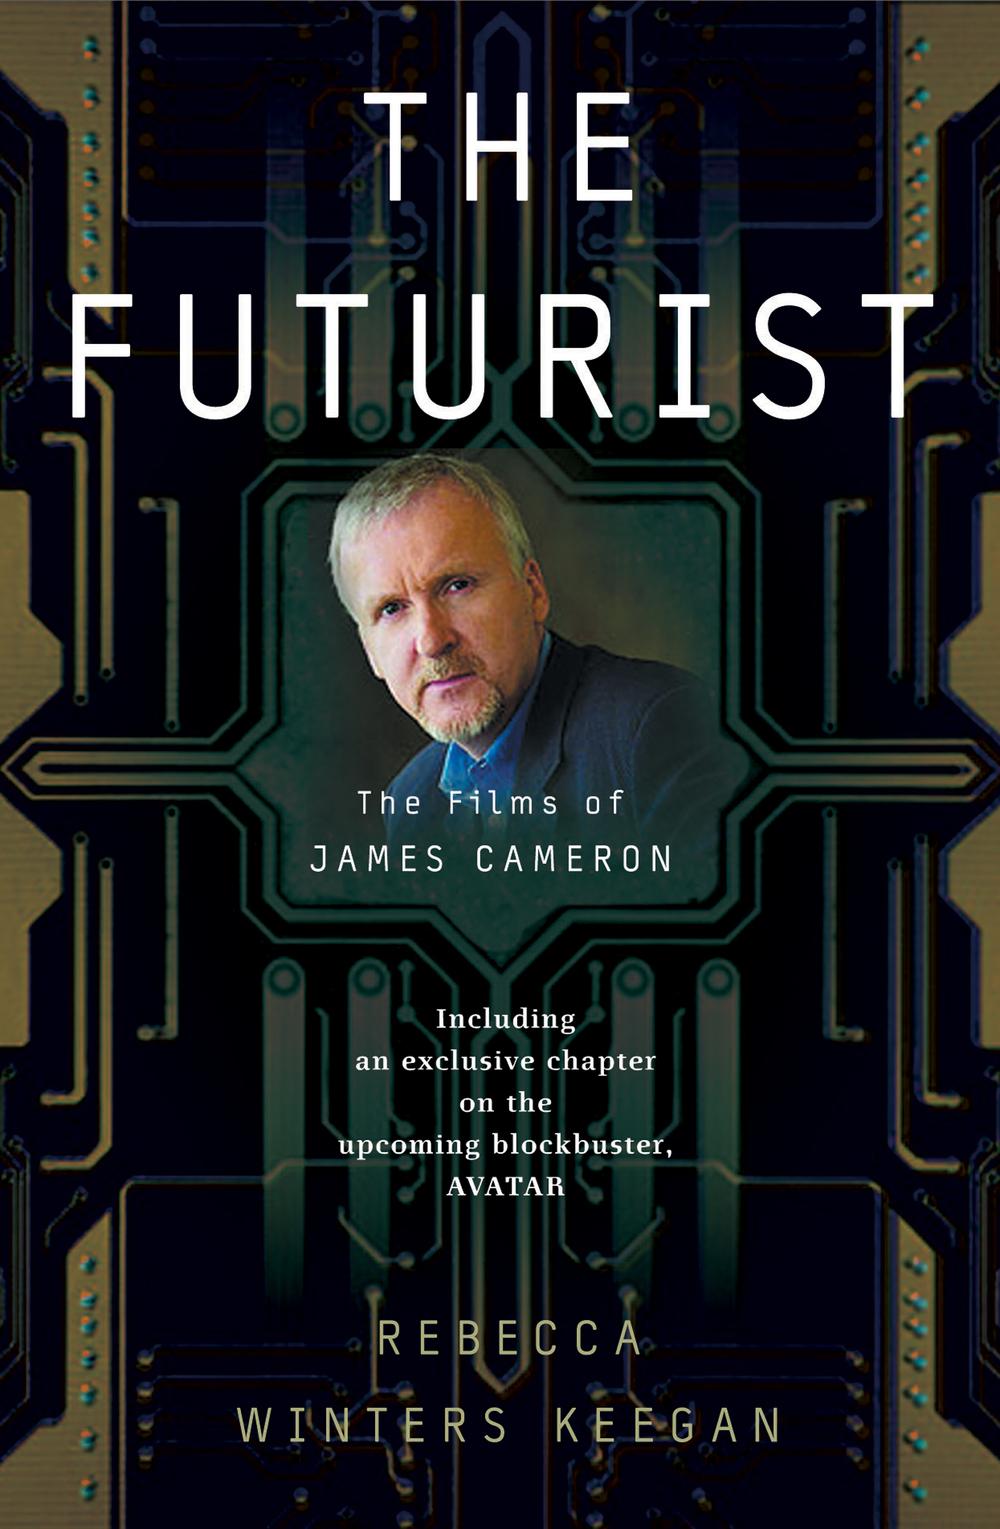 THE-FUTURIST-ss6.jpg